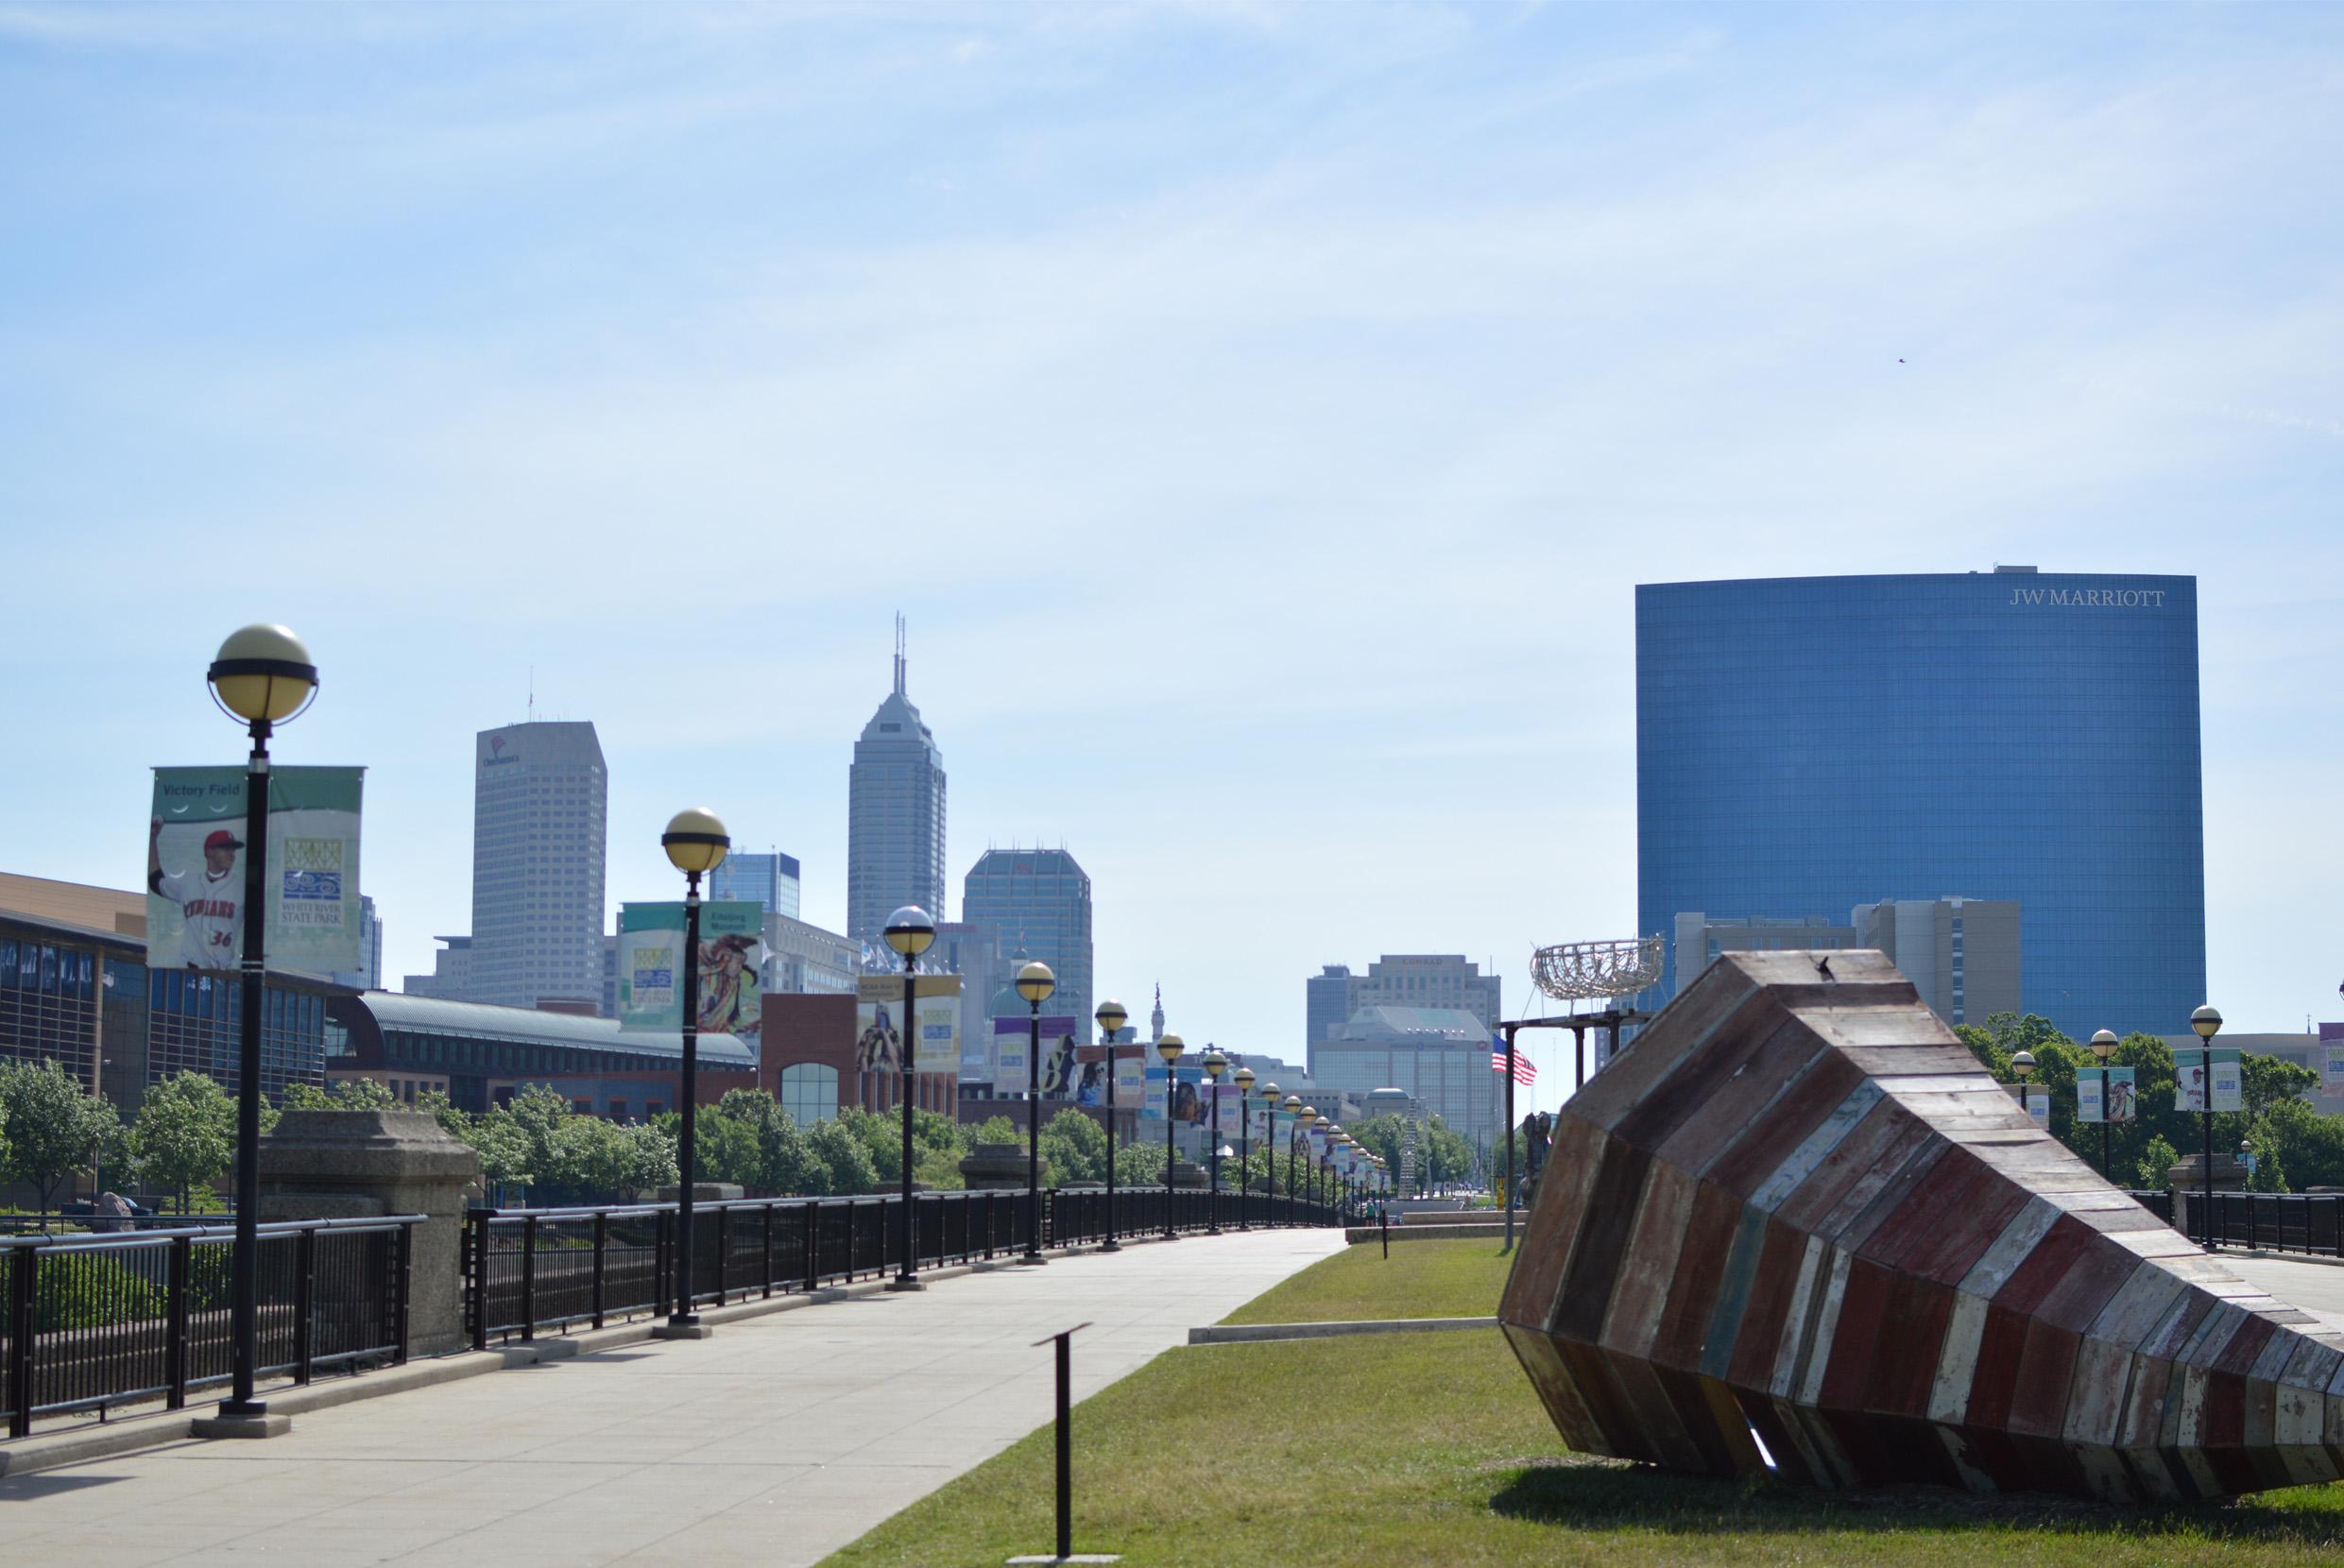 Indianapolis City Scape